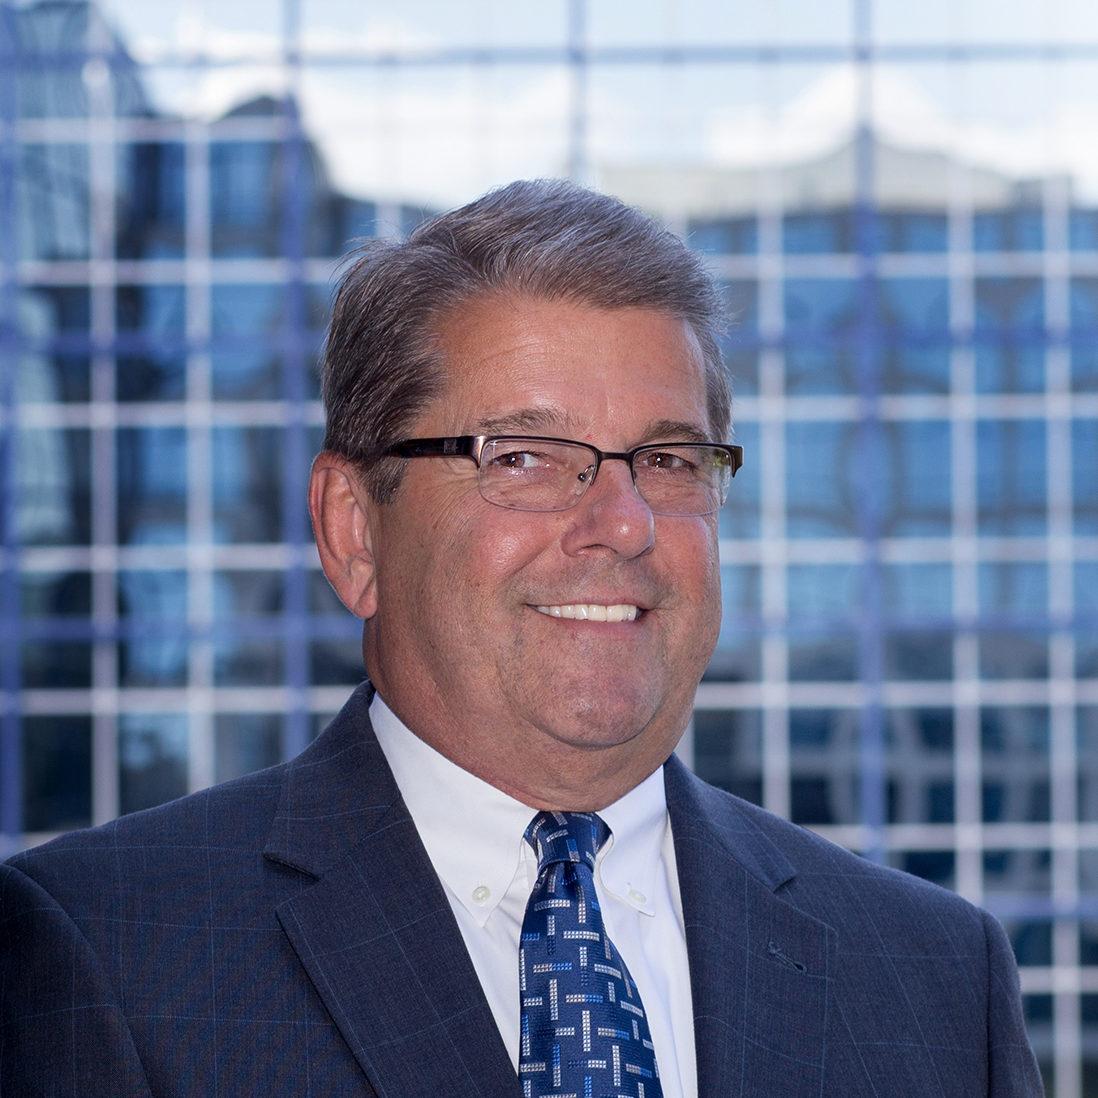 Greg Zuzack, LEED Green Associate, Vice President LANDCO Construction